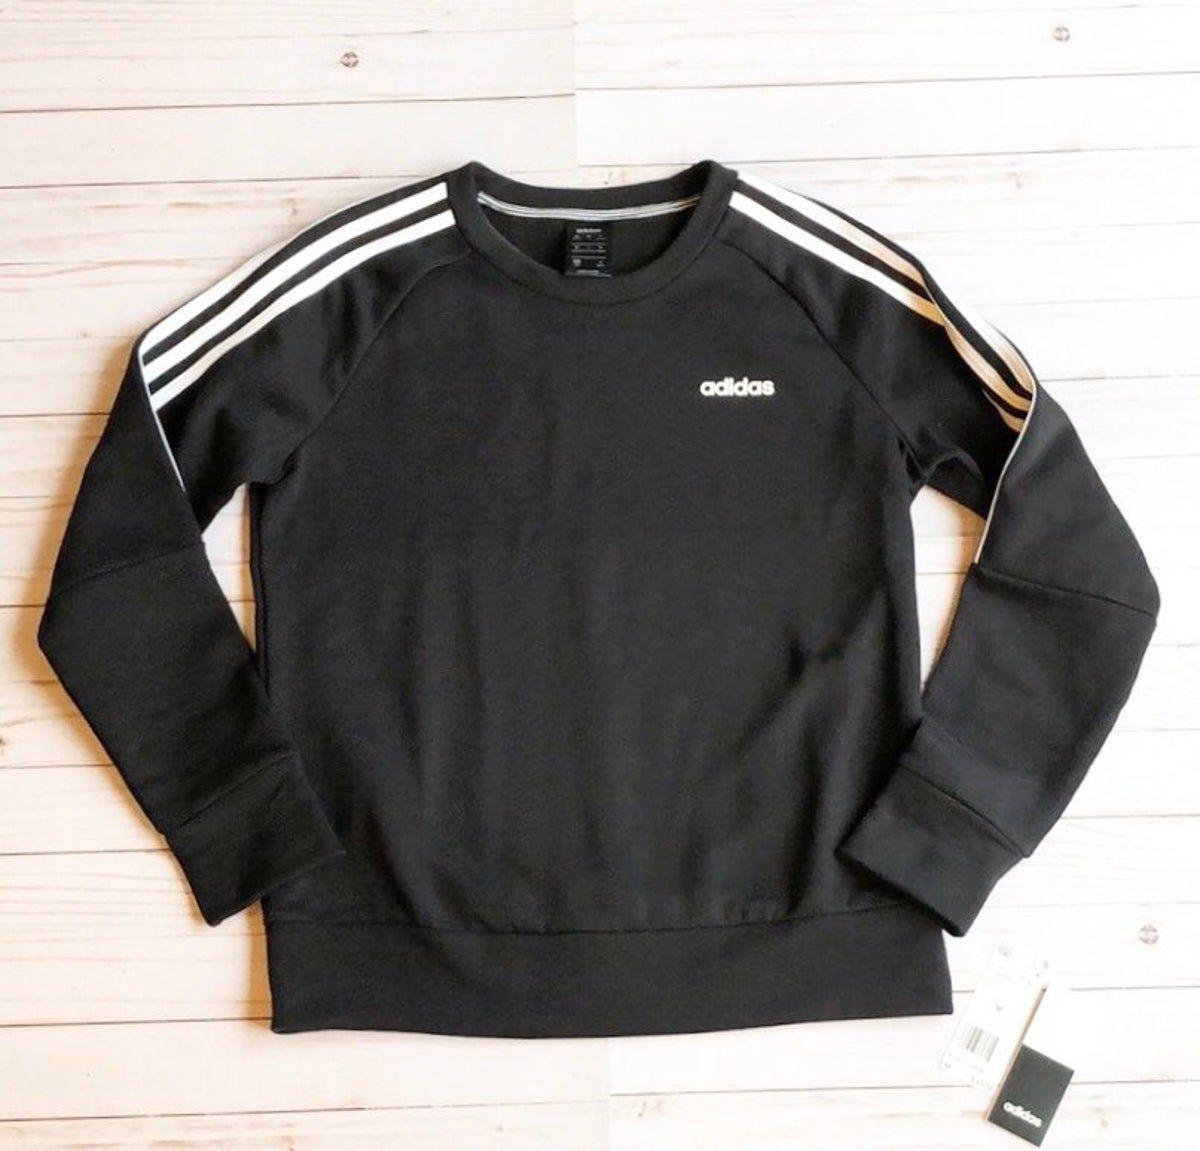 Adidas Crew Neck Sweatshirt Black Adidas Crew Neck Black Sweatshirts Crew Neck Sweatshirt [ 1151 x 1200 Pixel ]